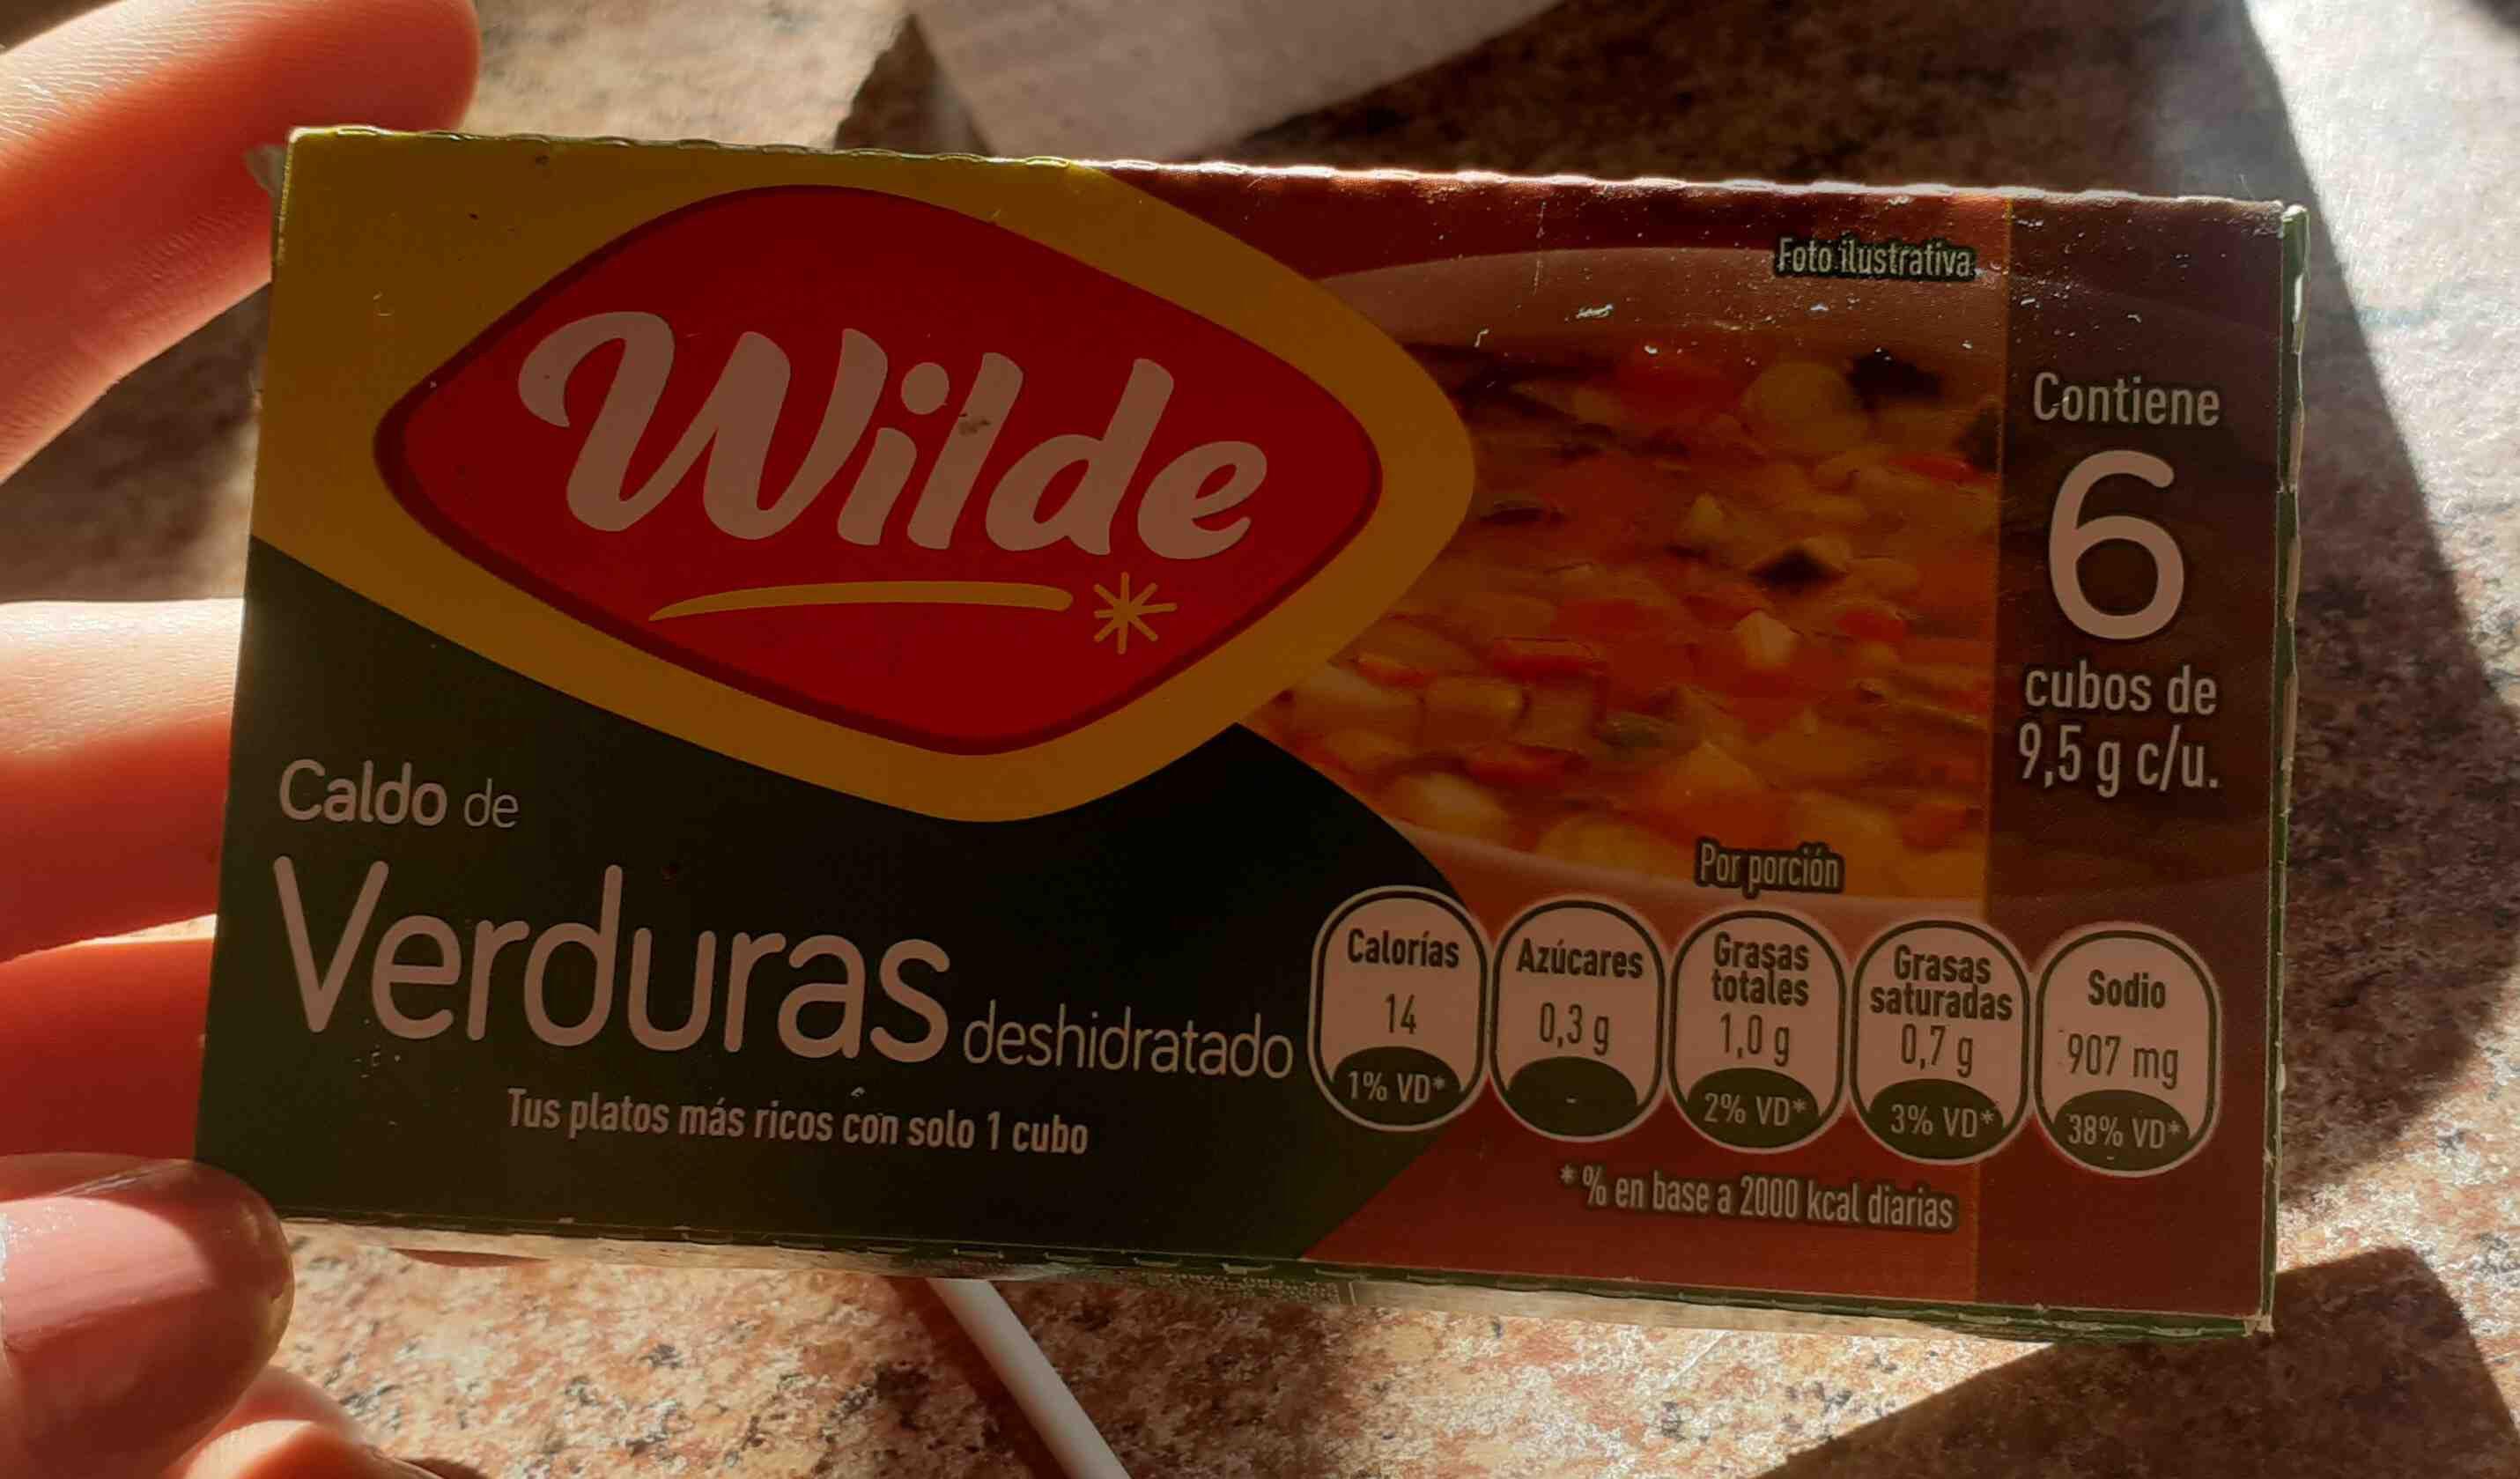 wilde caldo de verduras deshidratado - Producte - es